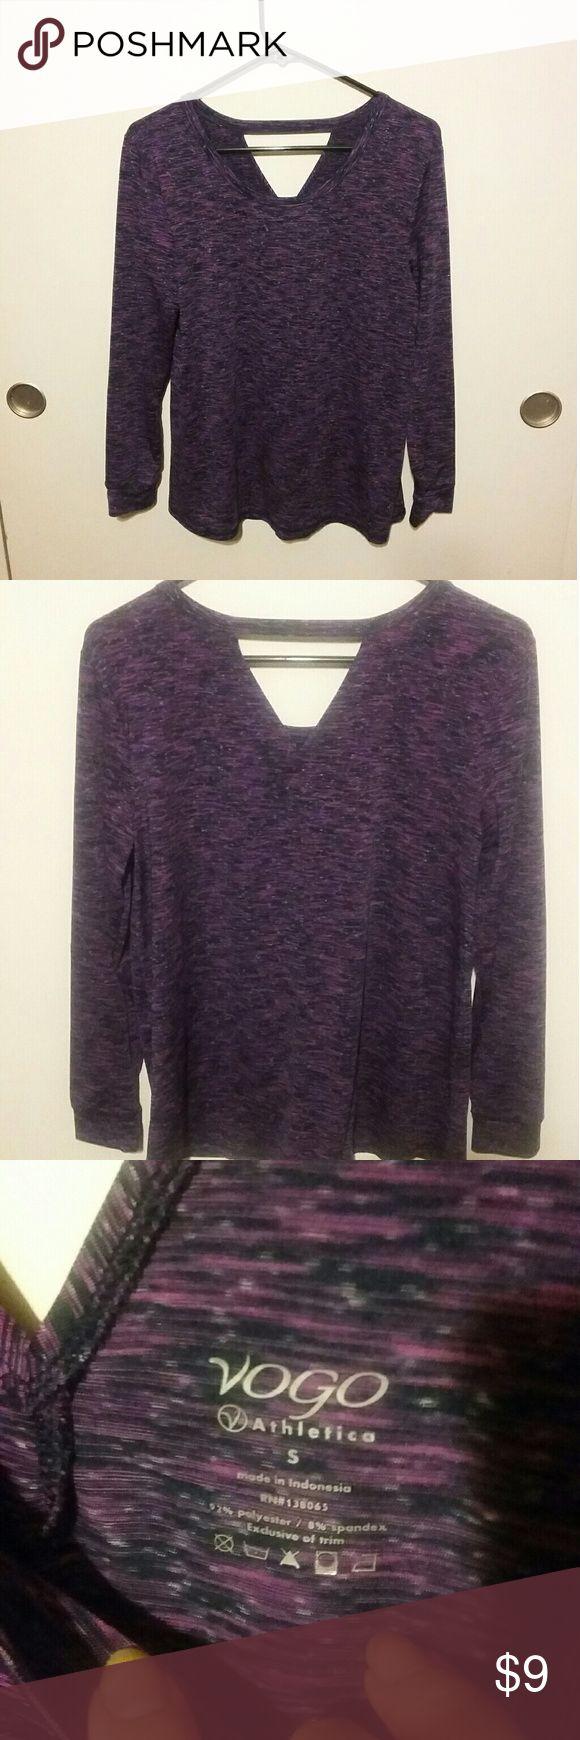 Vogo Athletica Purple Long Sleeve Top Vogo Athletica Purple Long Sleeve Top Vogo Athletica Tops Tees - Long Sleeve